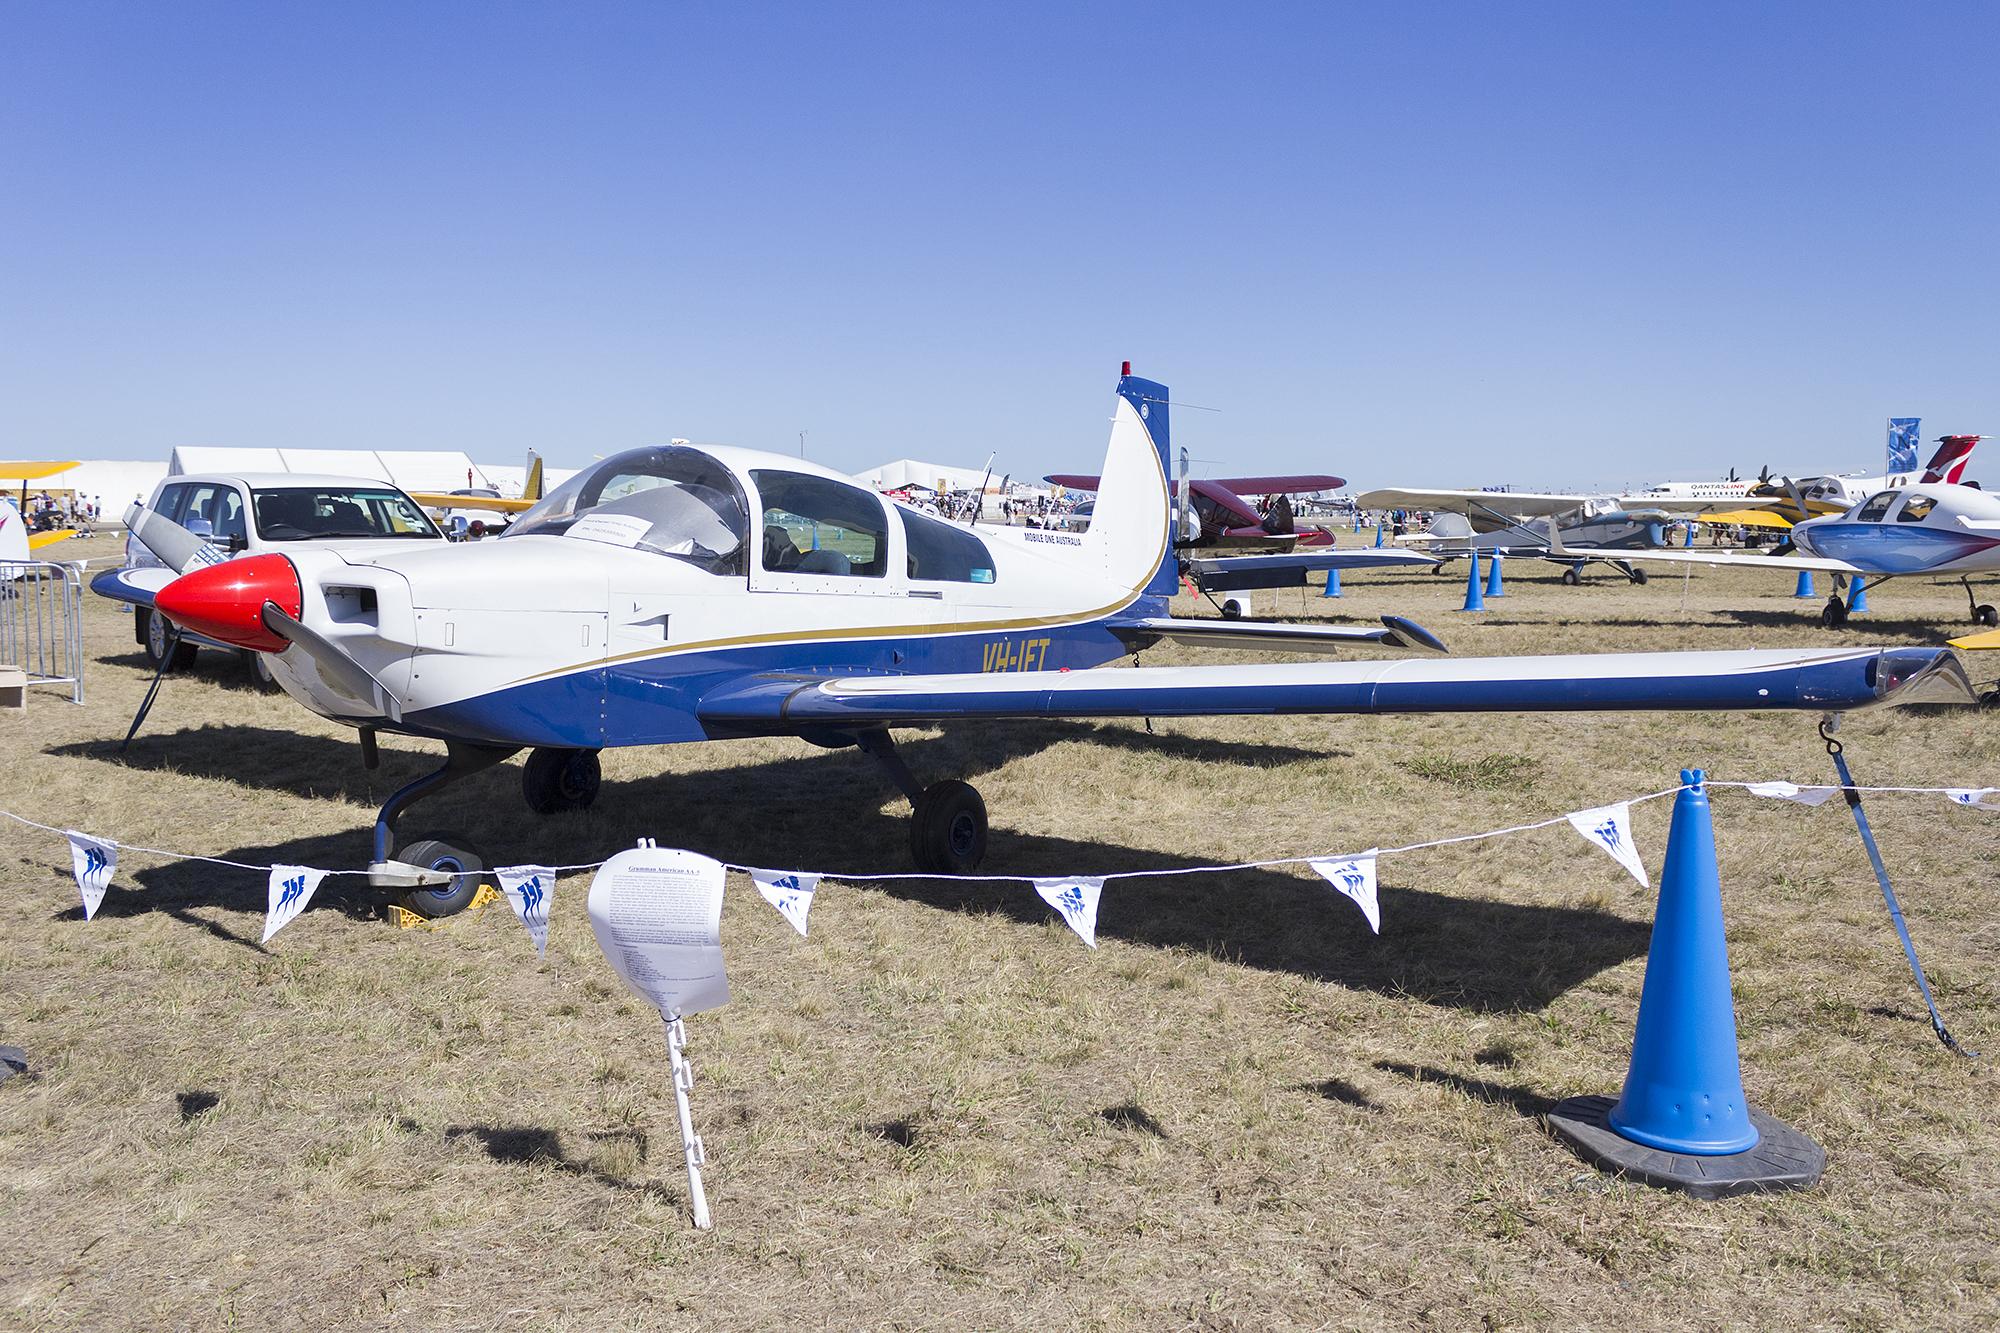 File:Mobile One Australia (VH-IFT) Grumman American AA-5B Tiger at